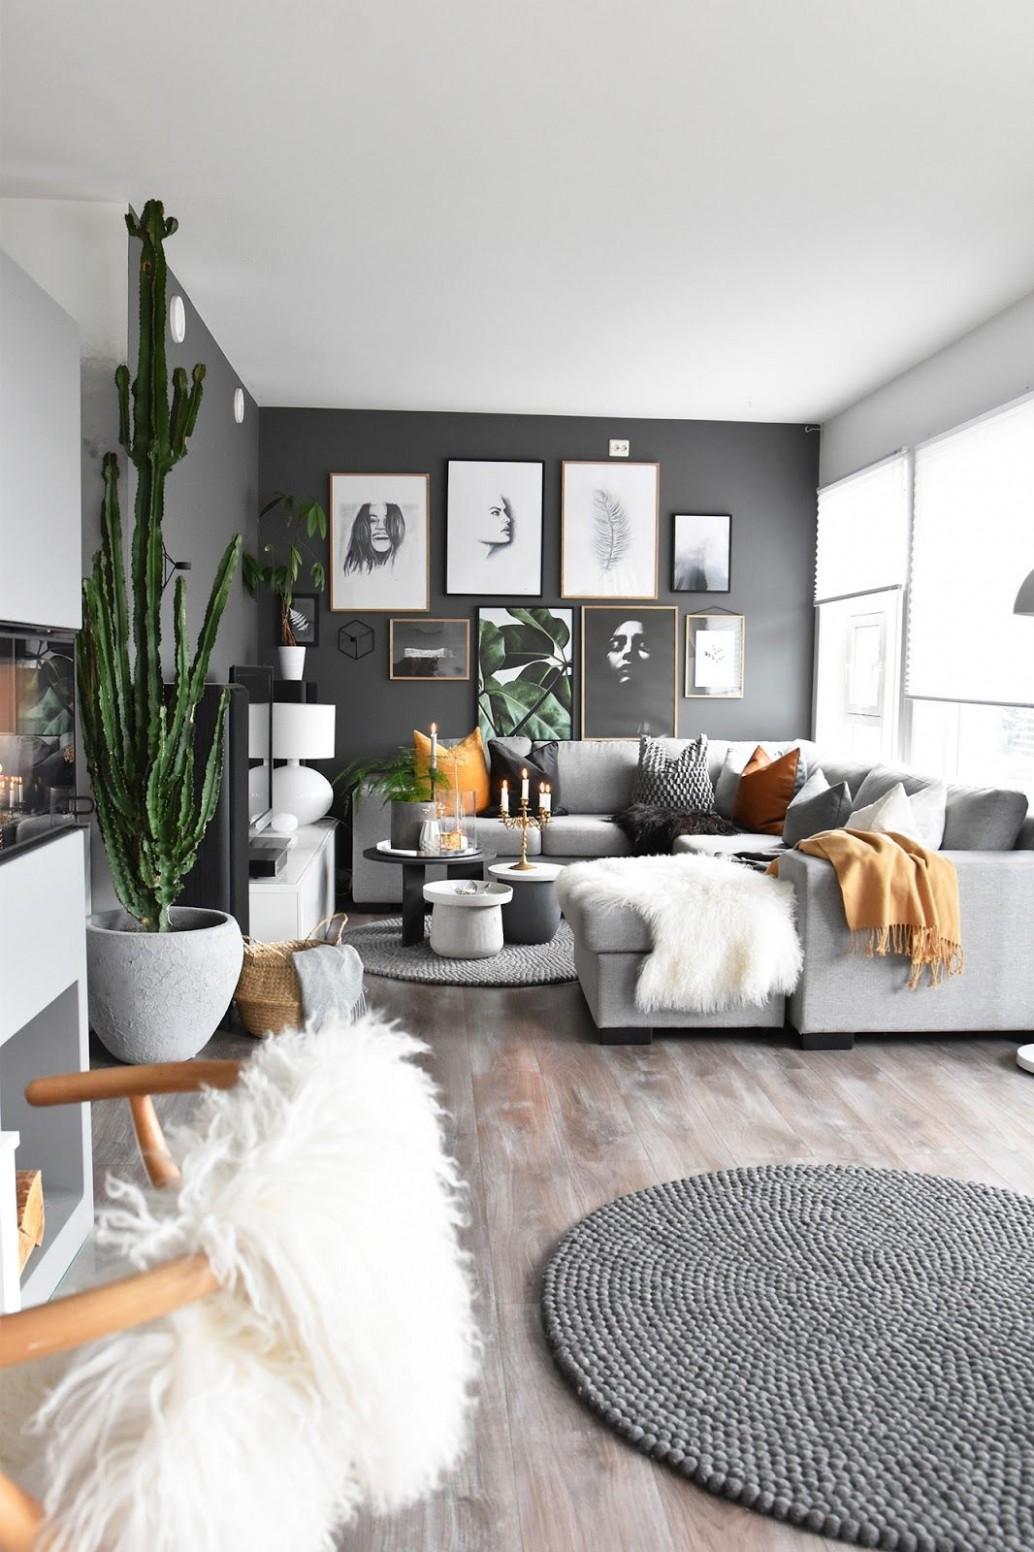 Pinterest // @JusLiv  College apartment decor, Apartment  - Apartment Decor Ideas Tumblr